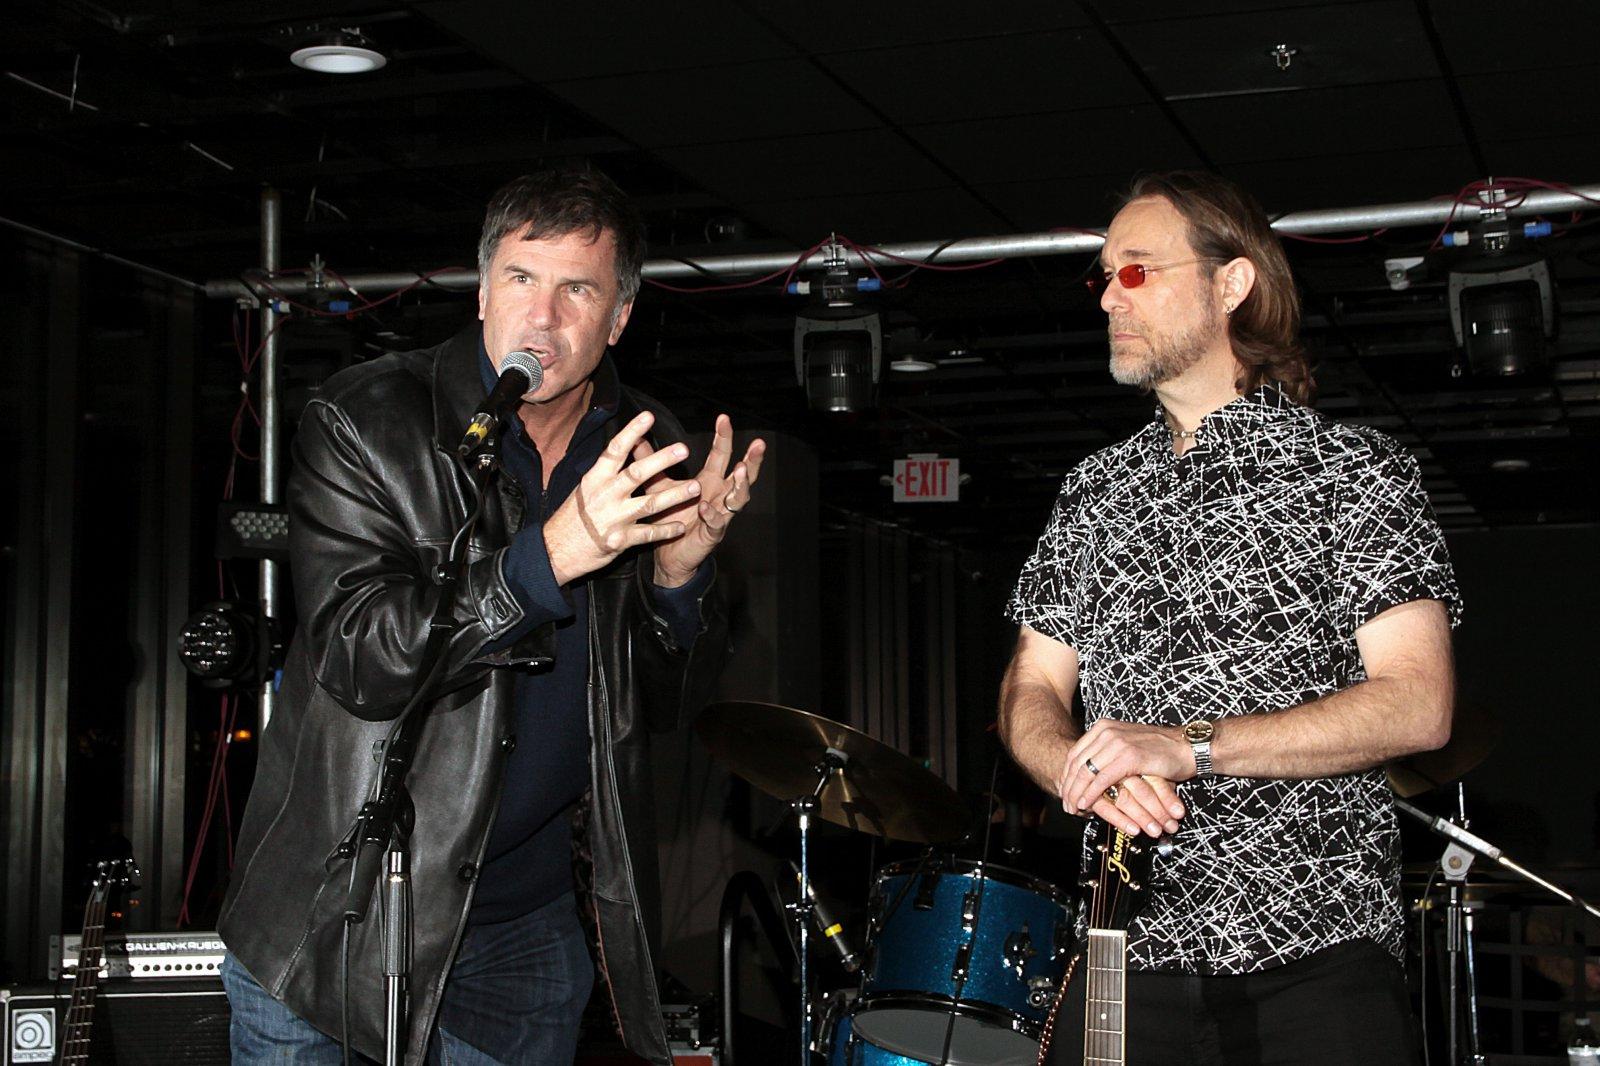 Brad Smith and Patrick Nettesheim, founder of G4Vets